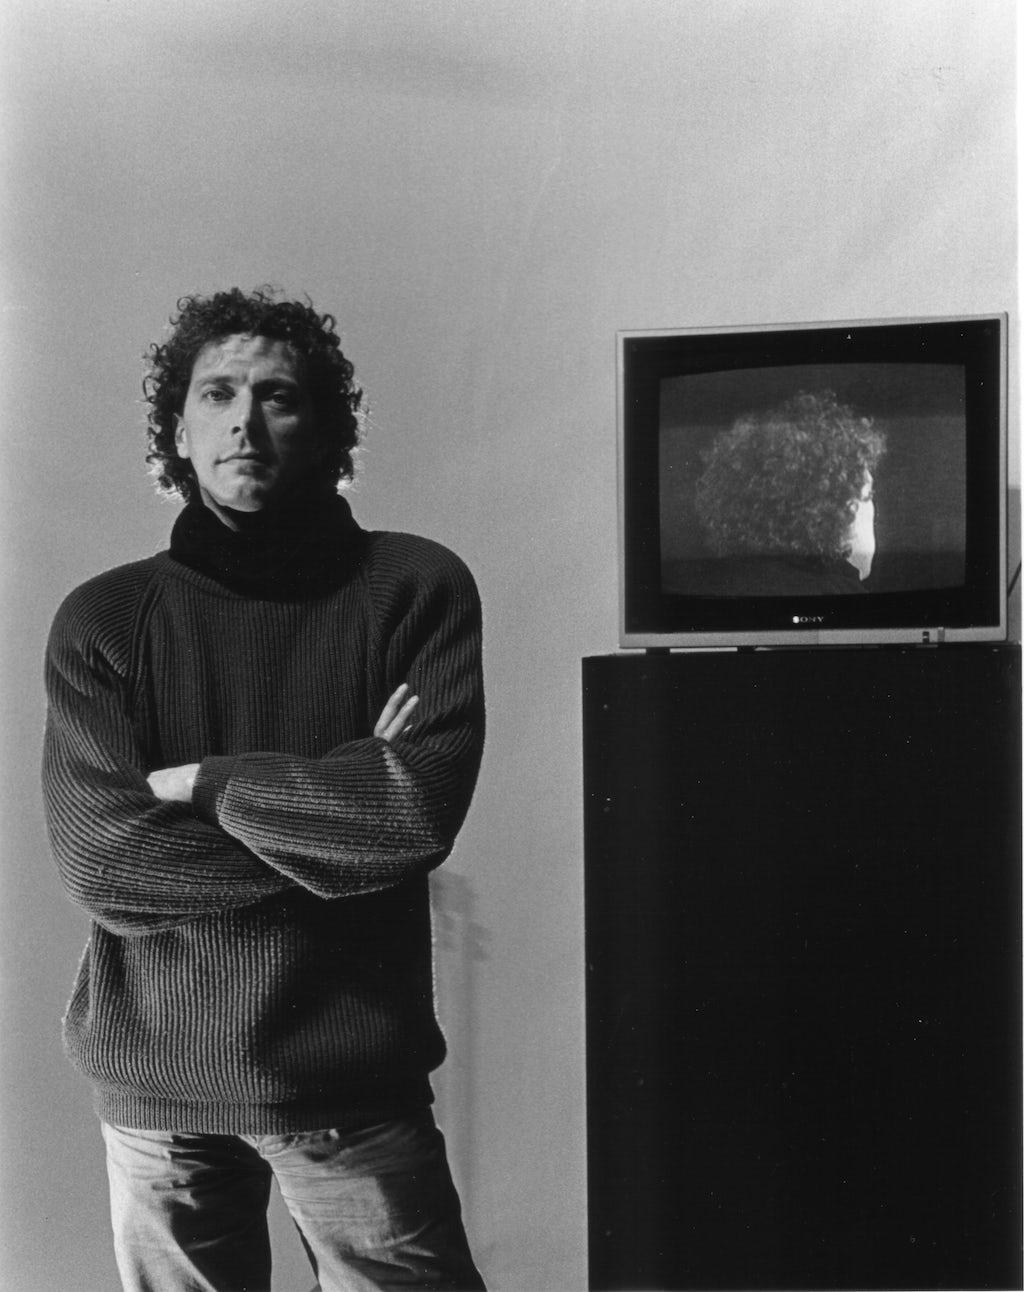 Hugo Roelandt, Zelfportret met monitor, 1992